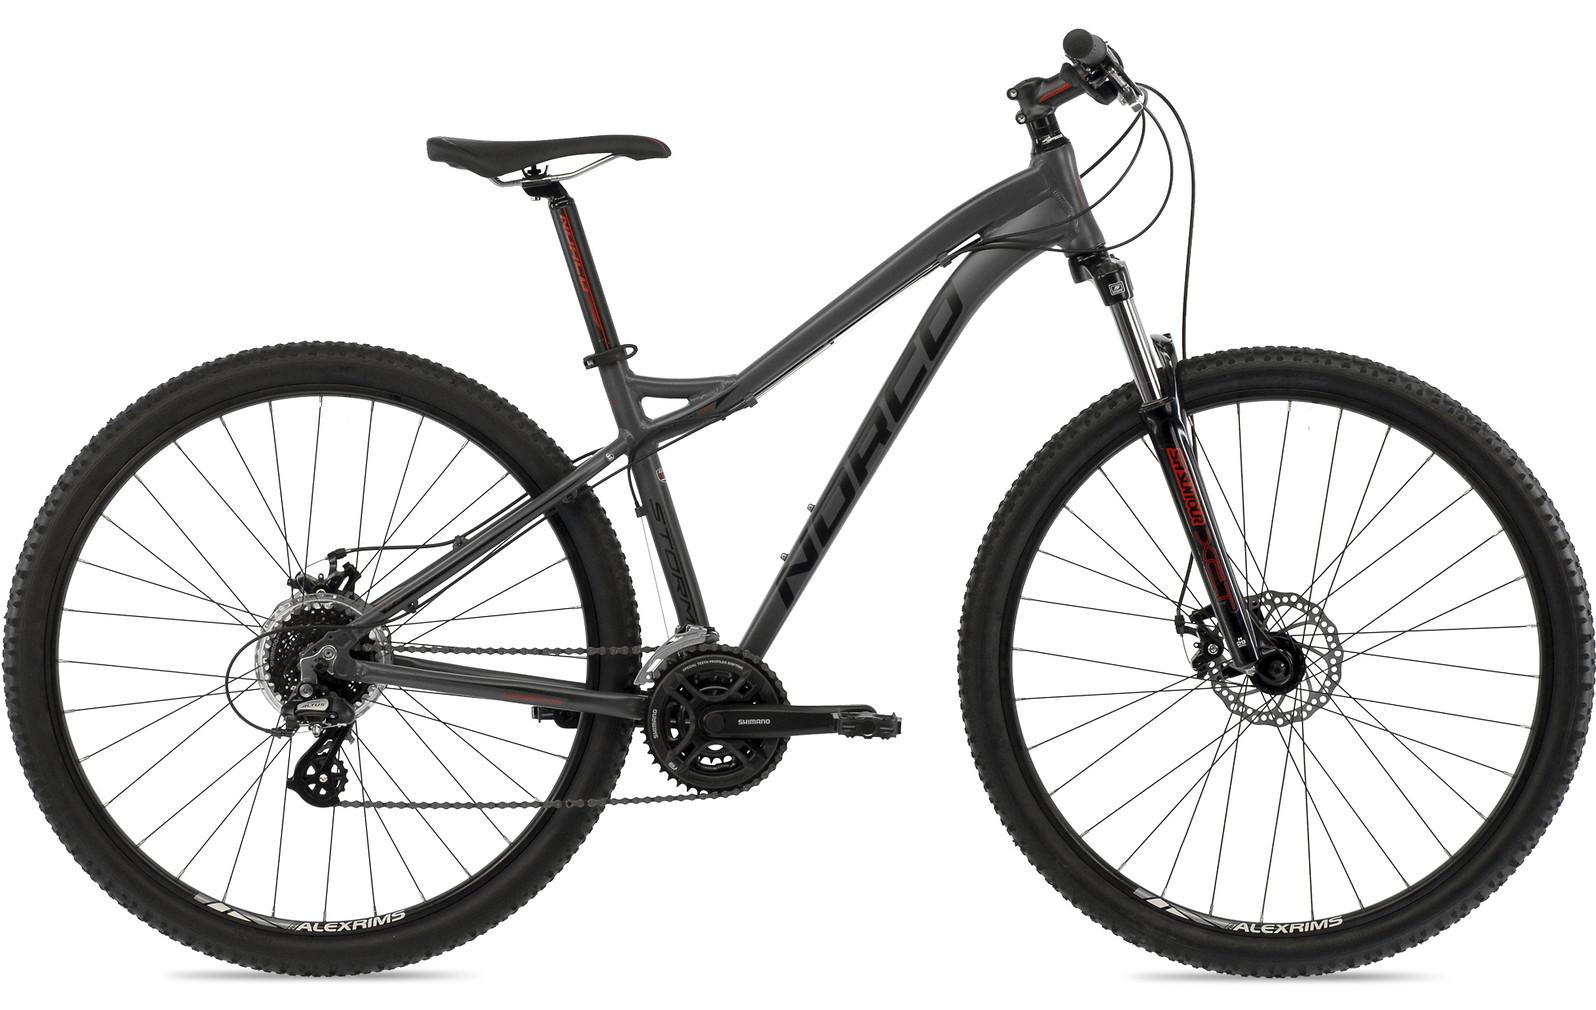 bike - 2014 Norco Storm 9.2 - Grey:Black